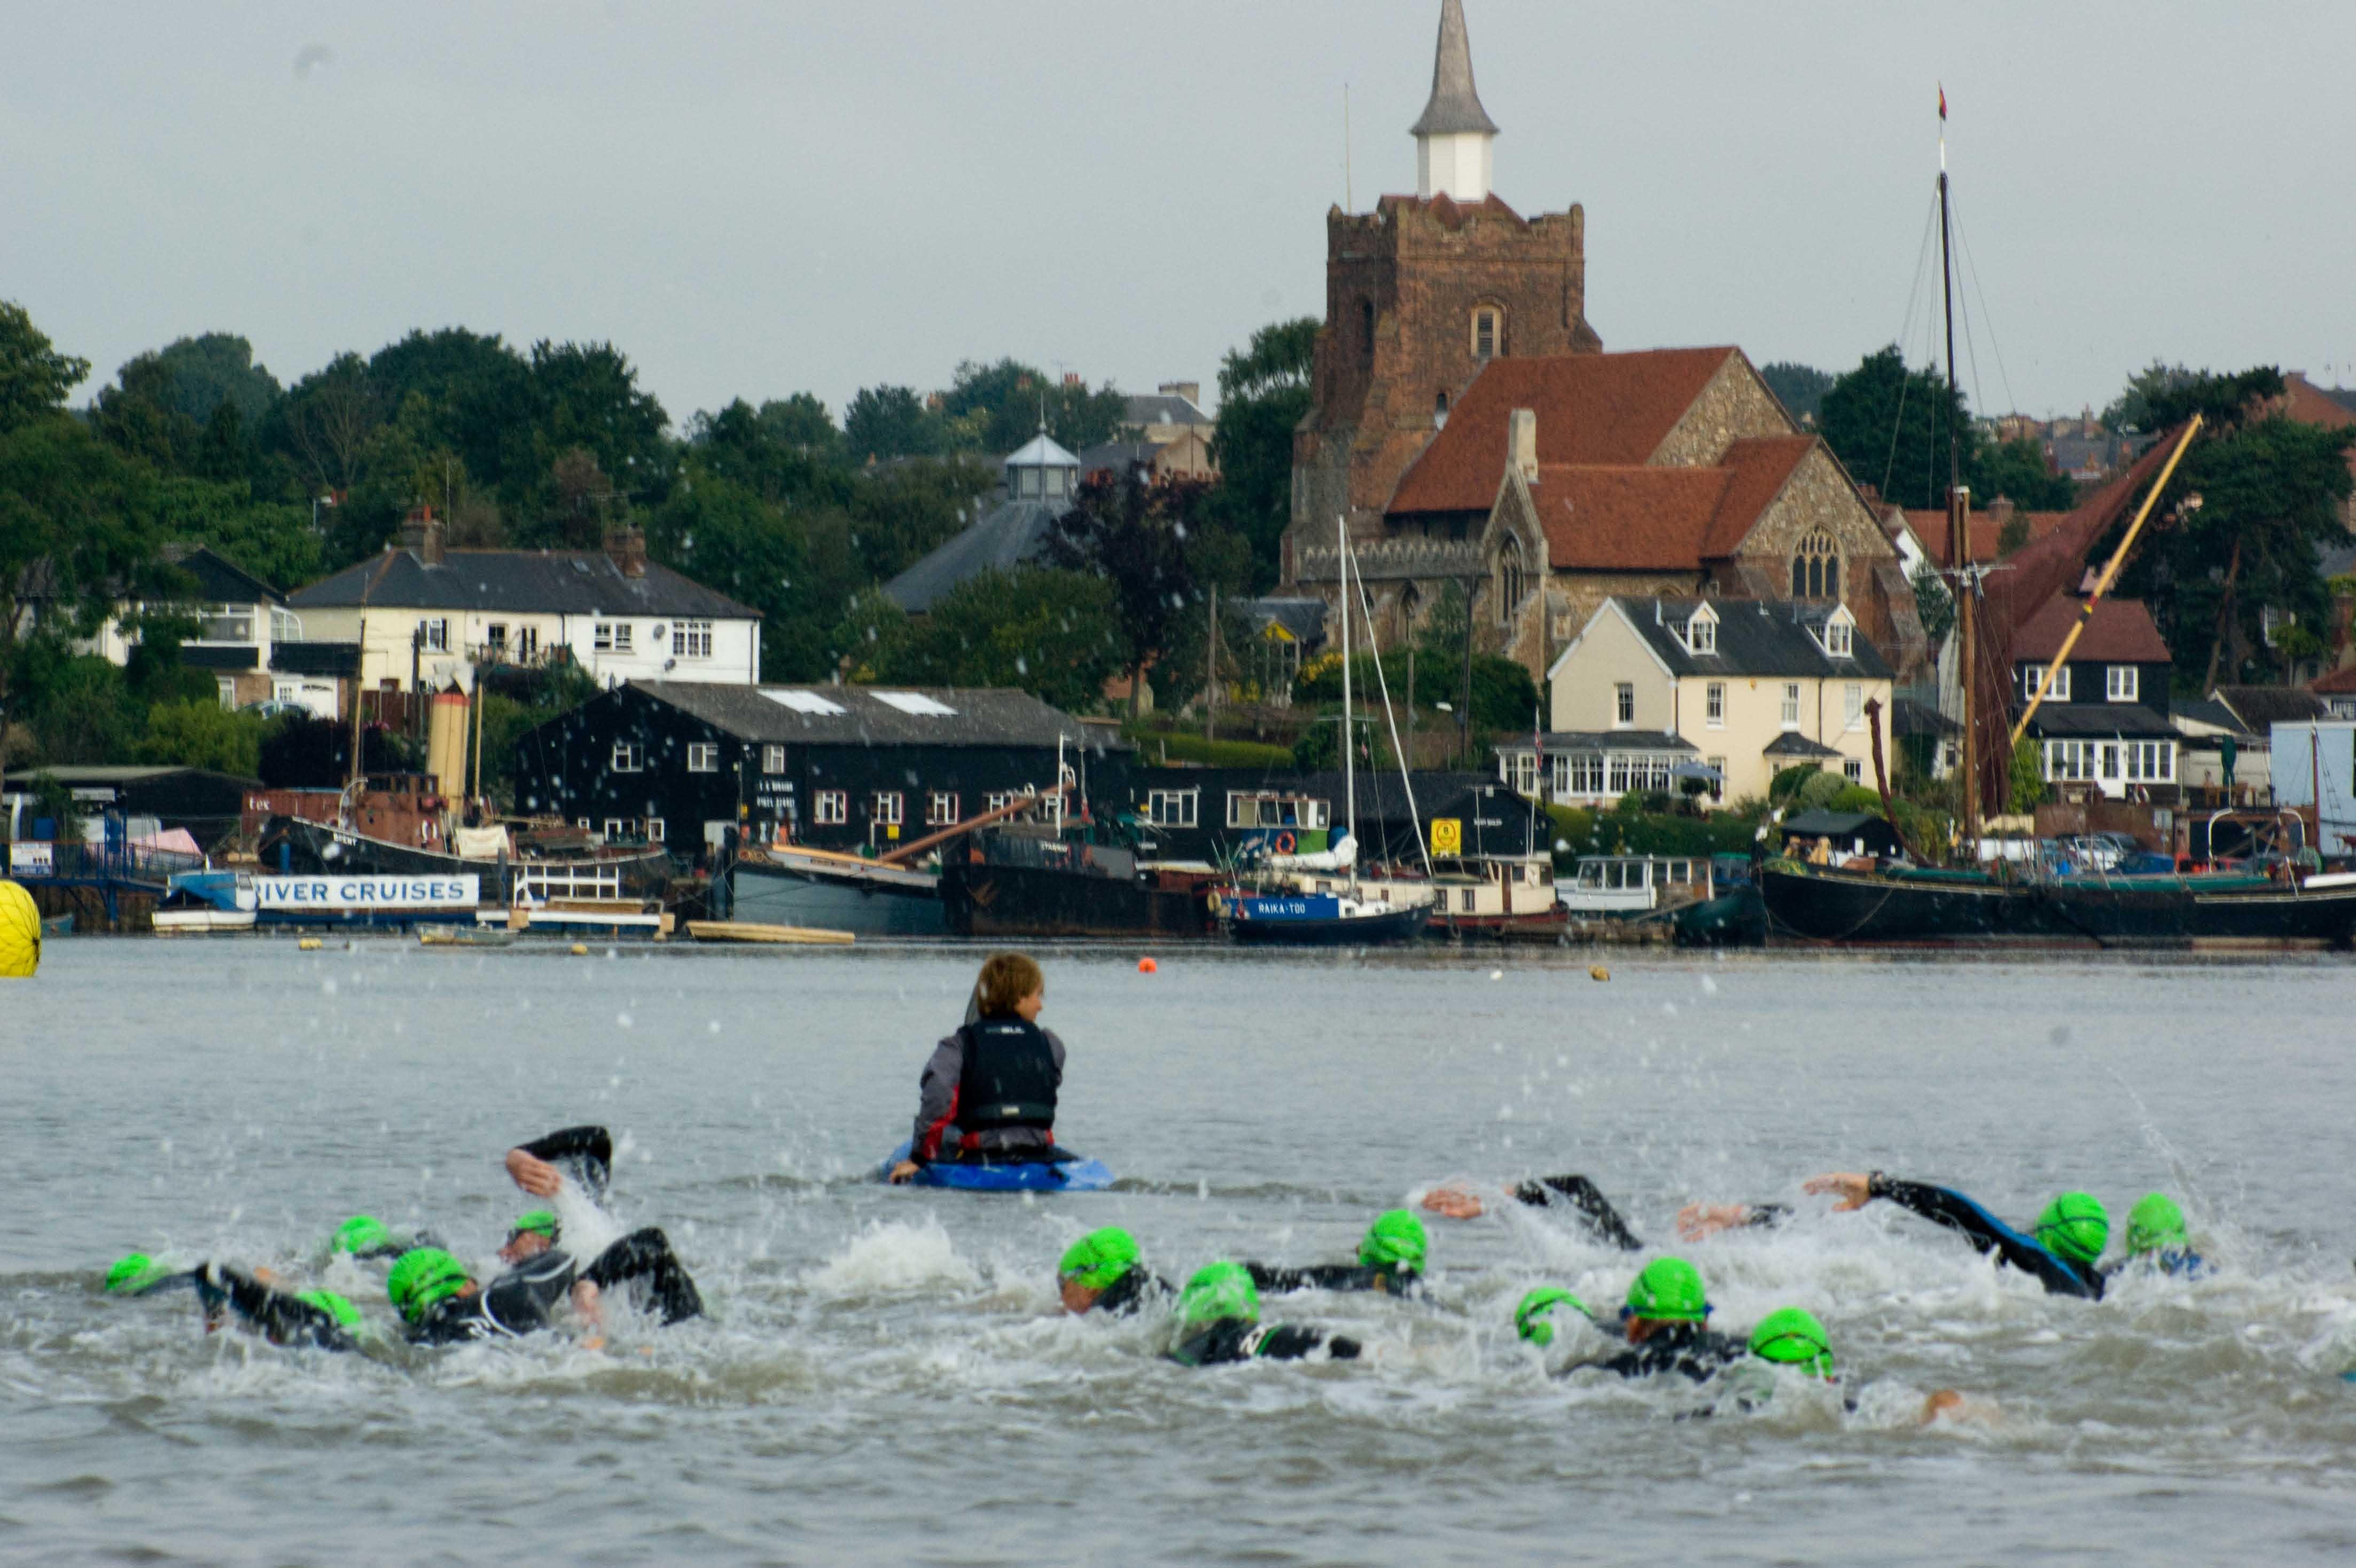 The Maldon Triathlon Olympic Distance